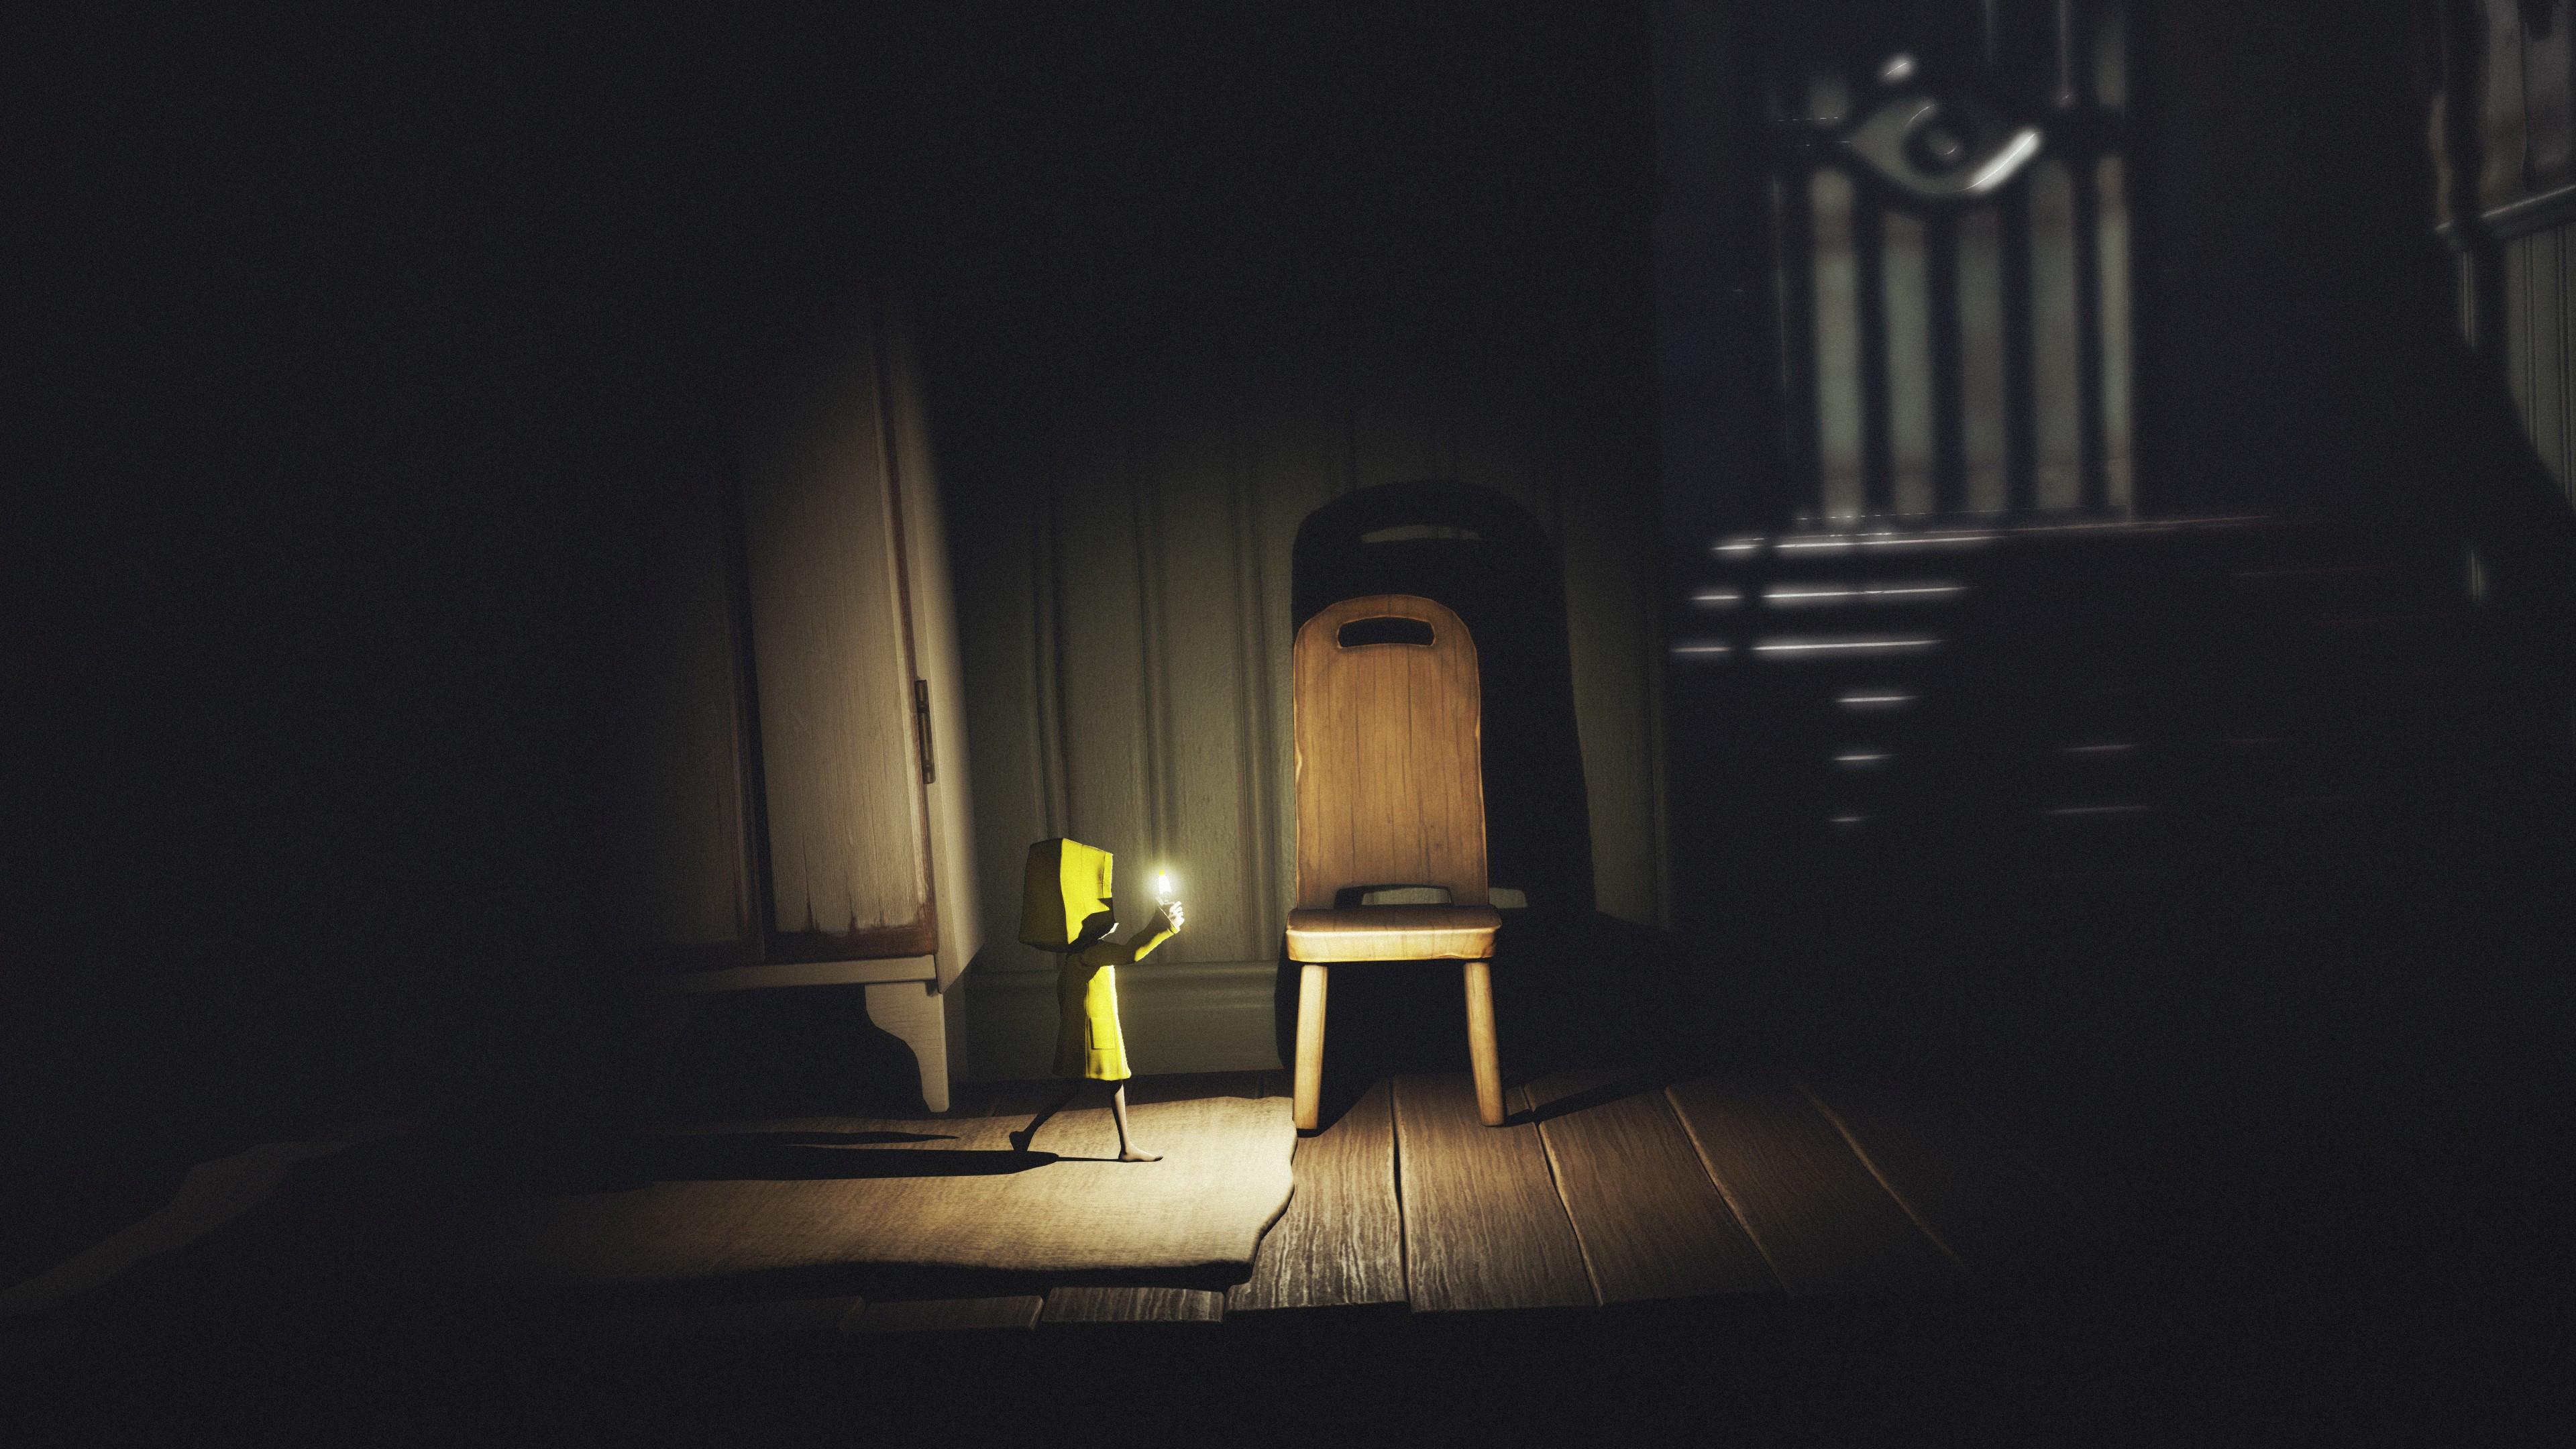 Little Nightmares startují pro PS4, Xbox One a PC na jaře 2017 128868